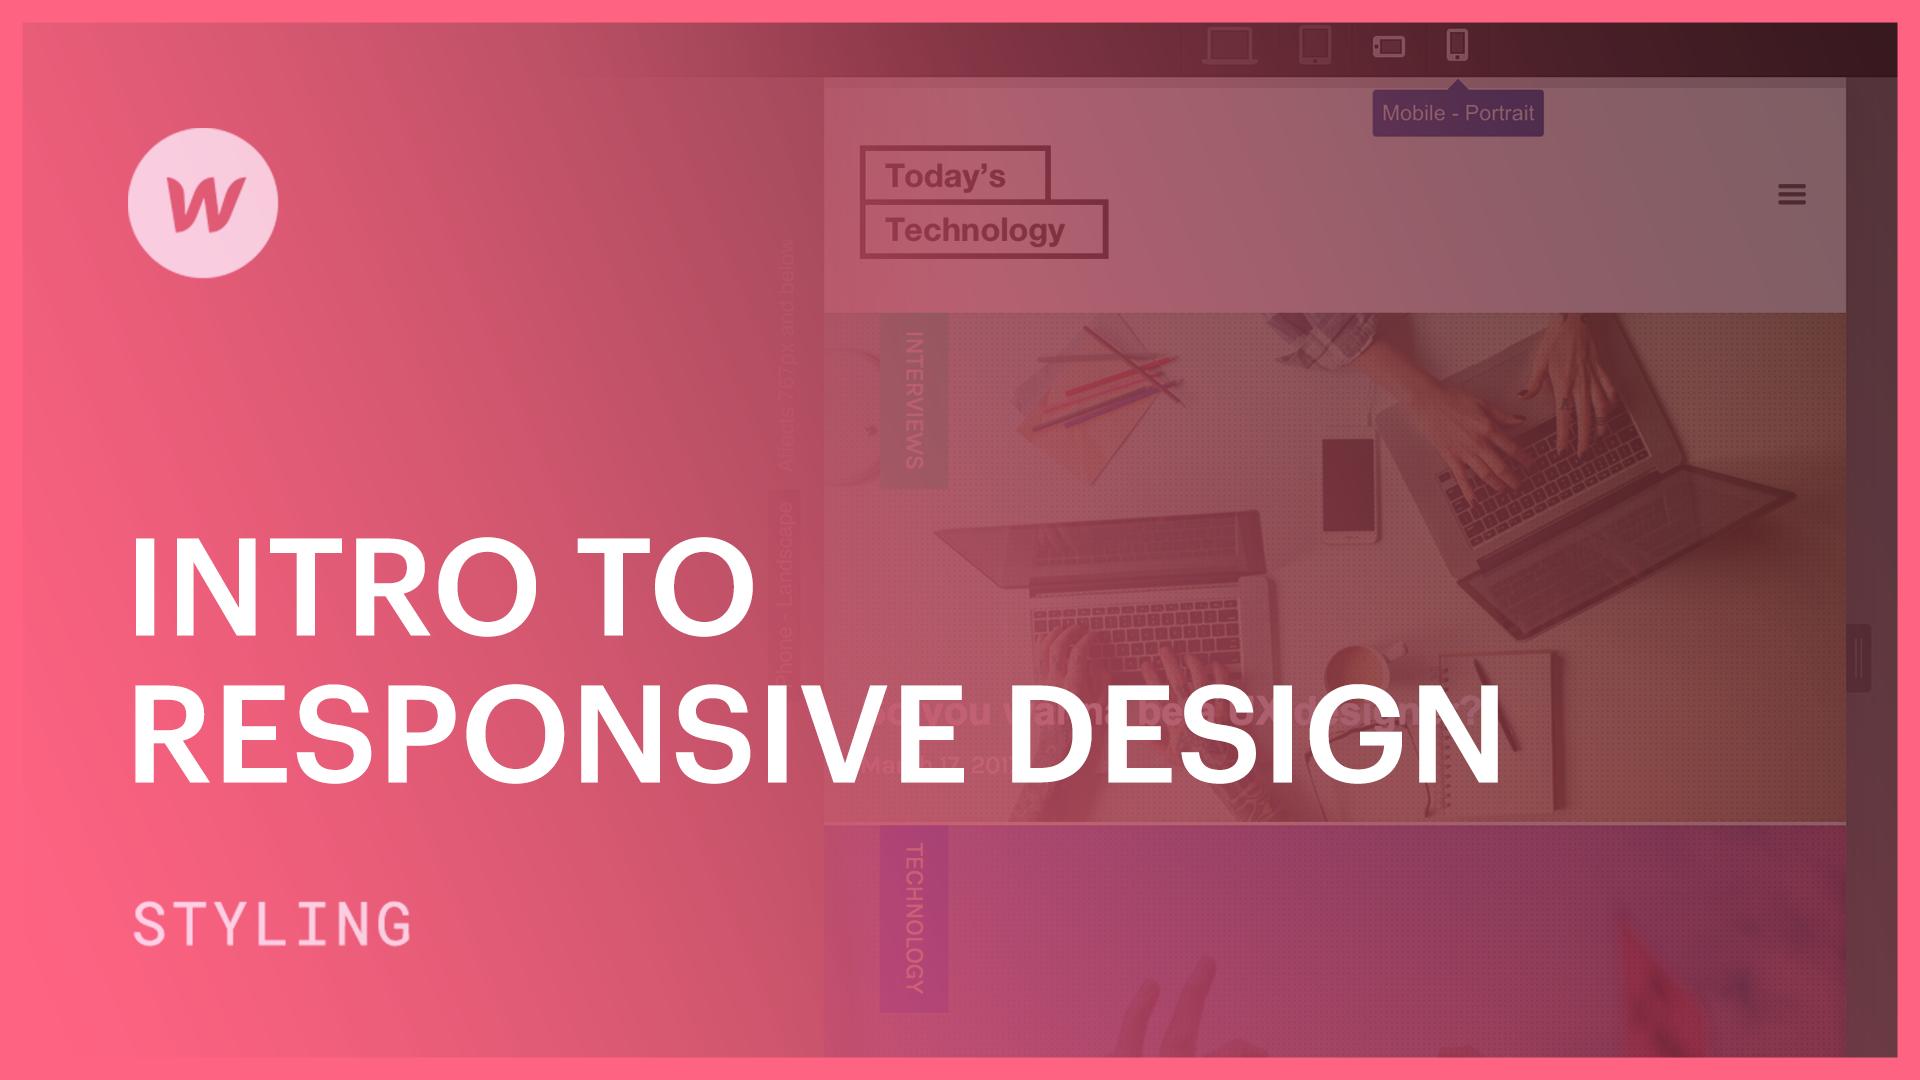 Intro to Responsive Design